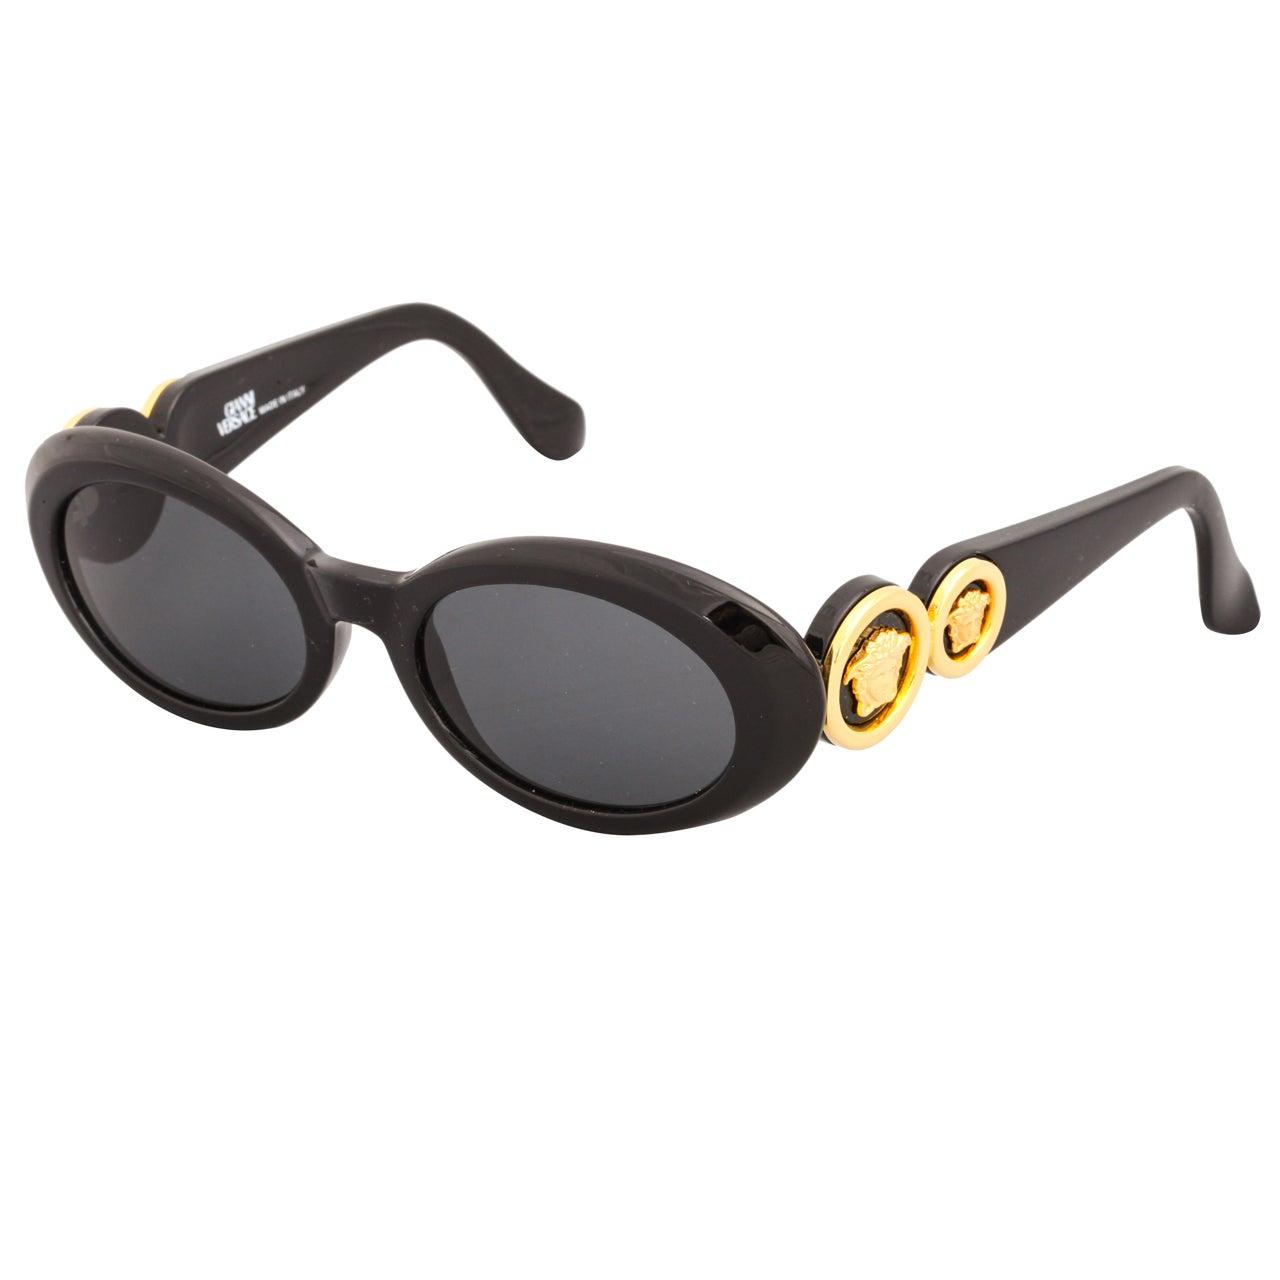 Greek Home Interiors Gianni Versace Medusa Sunglasses Mod 527 Col 852 For Sale